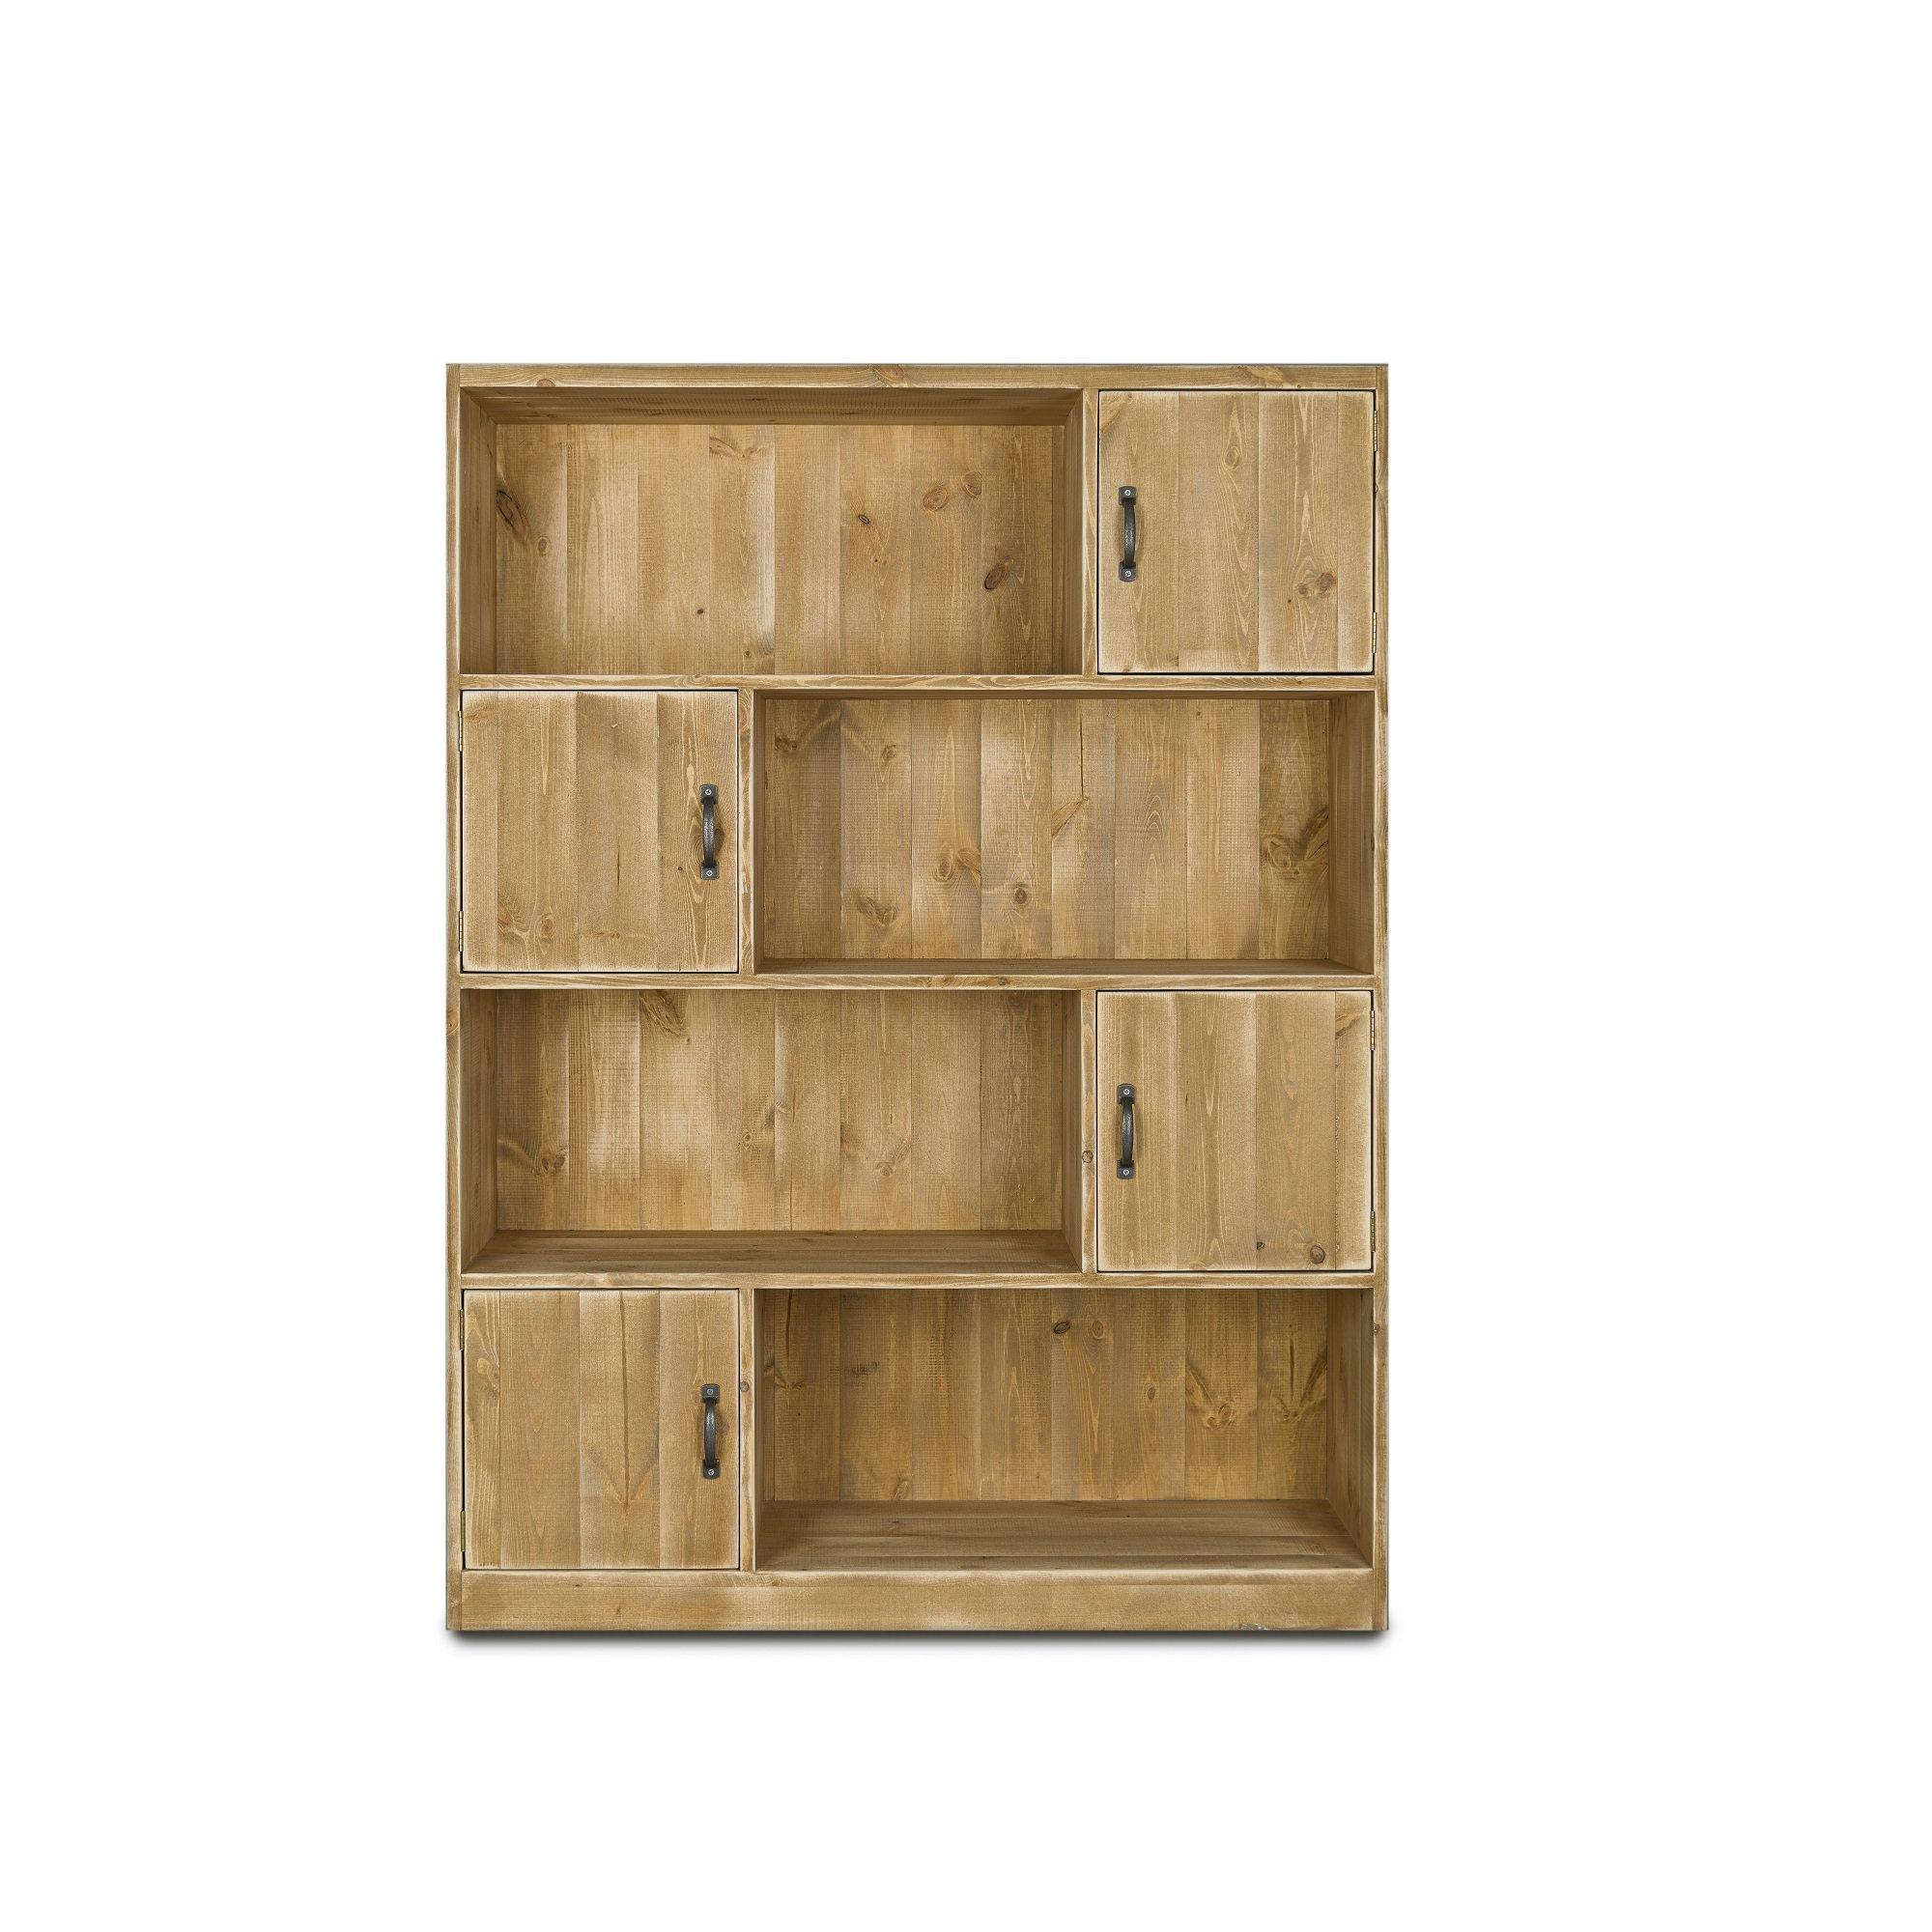 Bibliothèque 4 portes pin massif bois vieilli